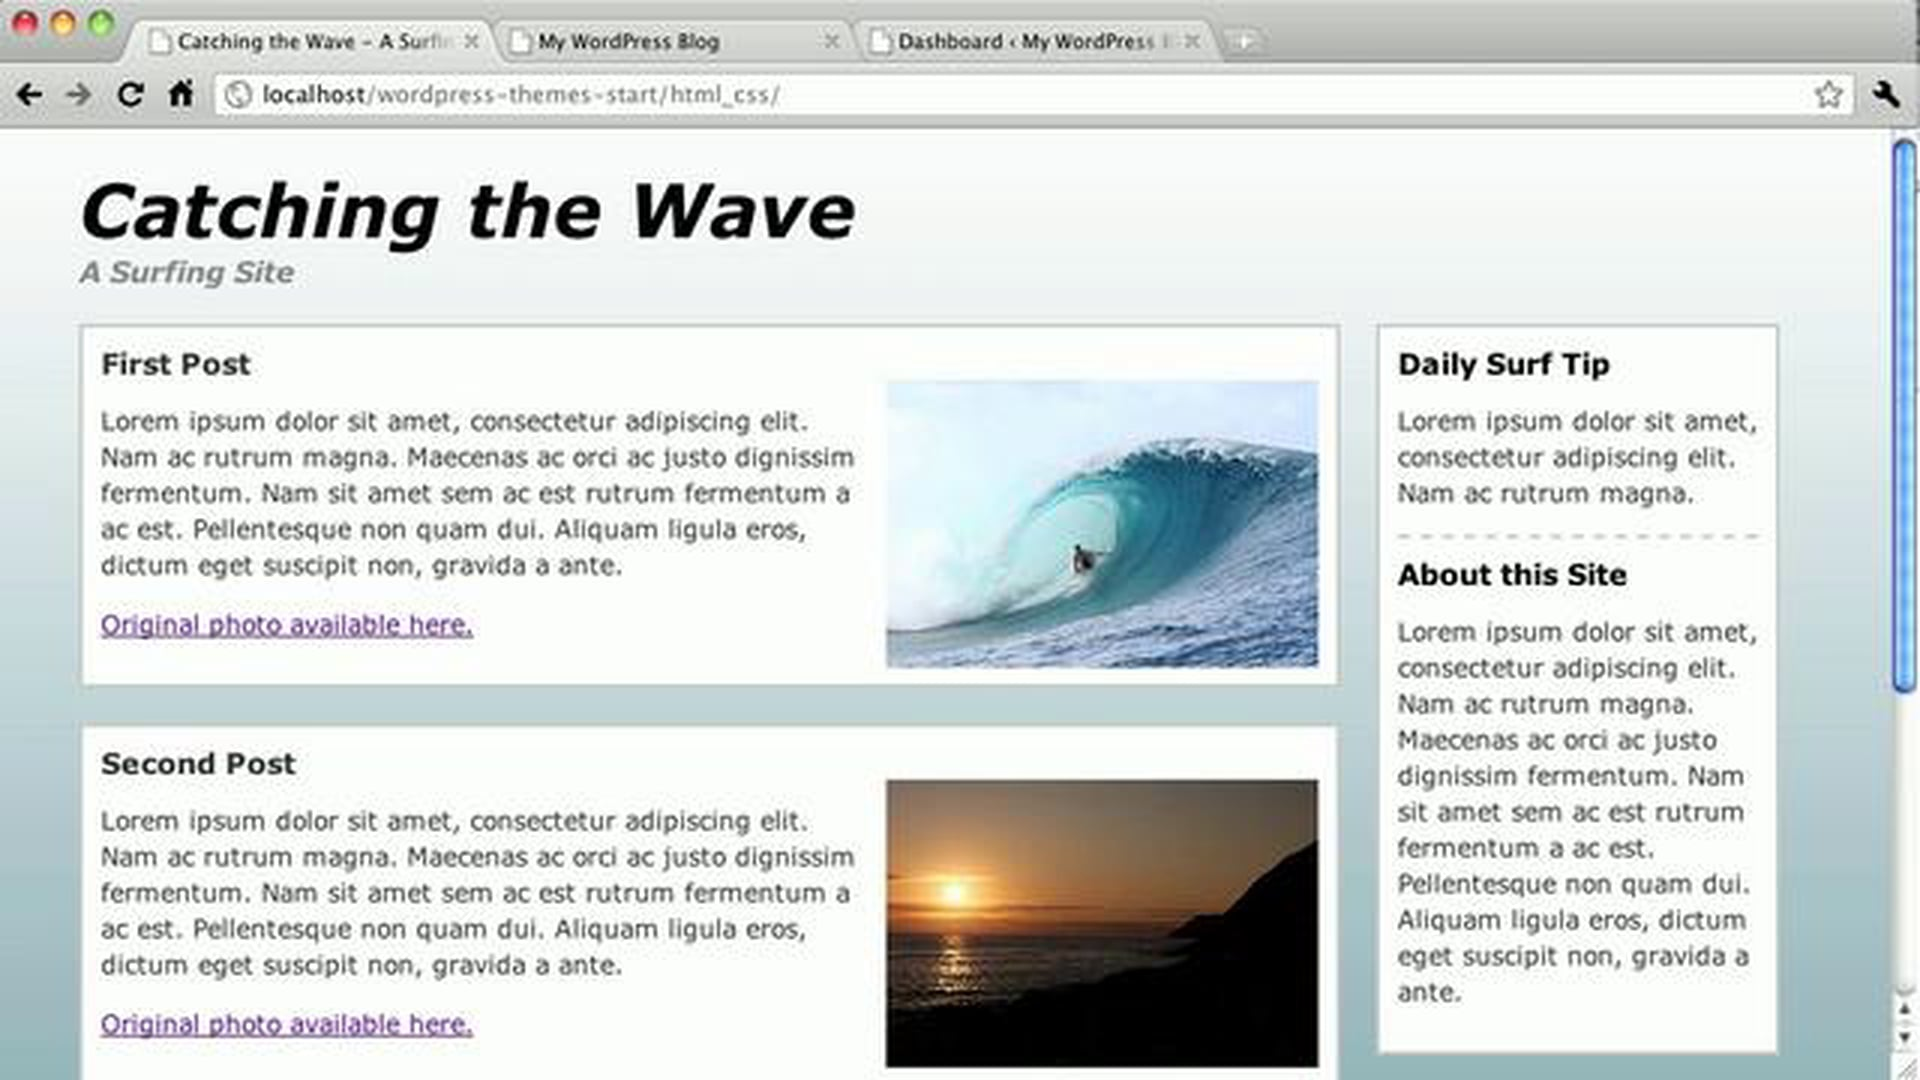 WordPress Themes: Starting a New Theme